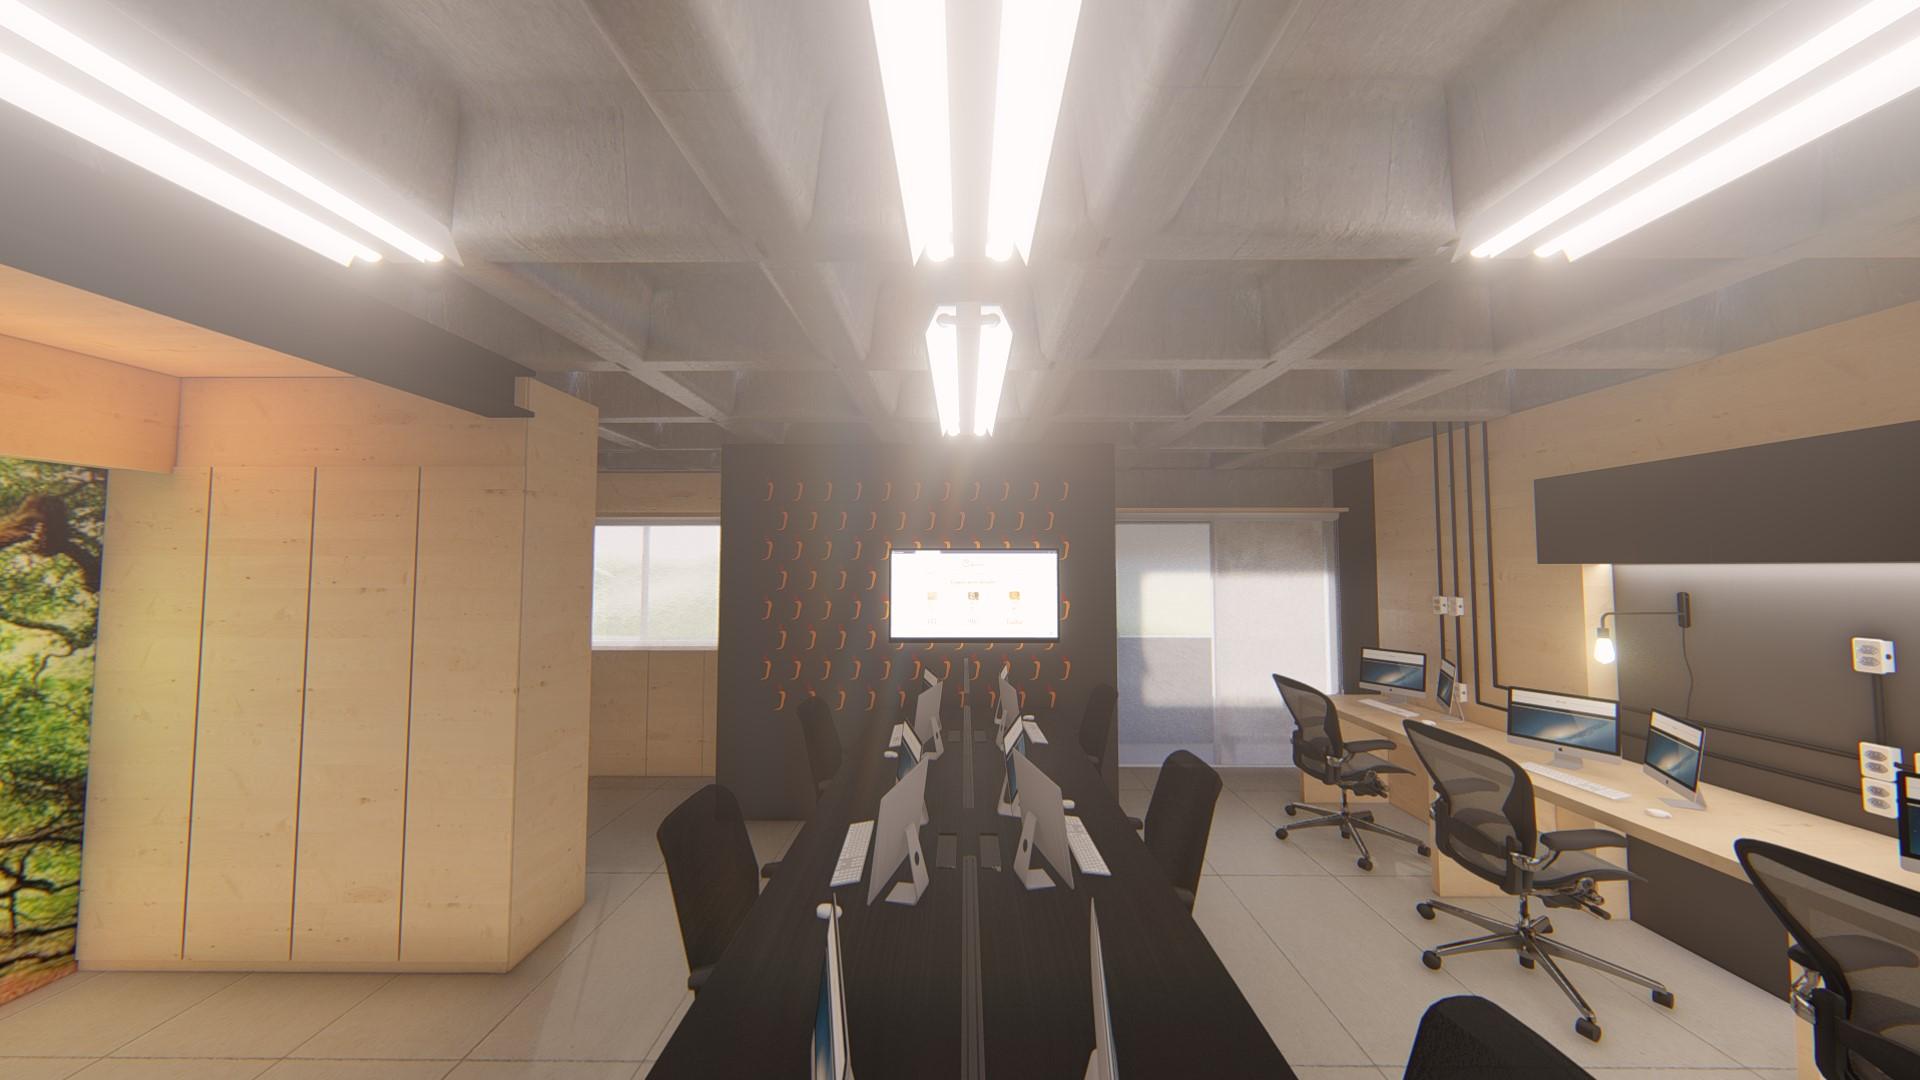 projeto-arquitetonico-cajueiro-duo-arquitetura-028.jpg